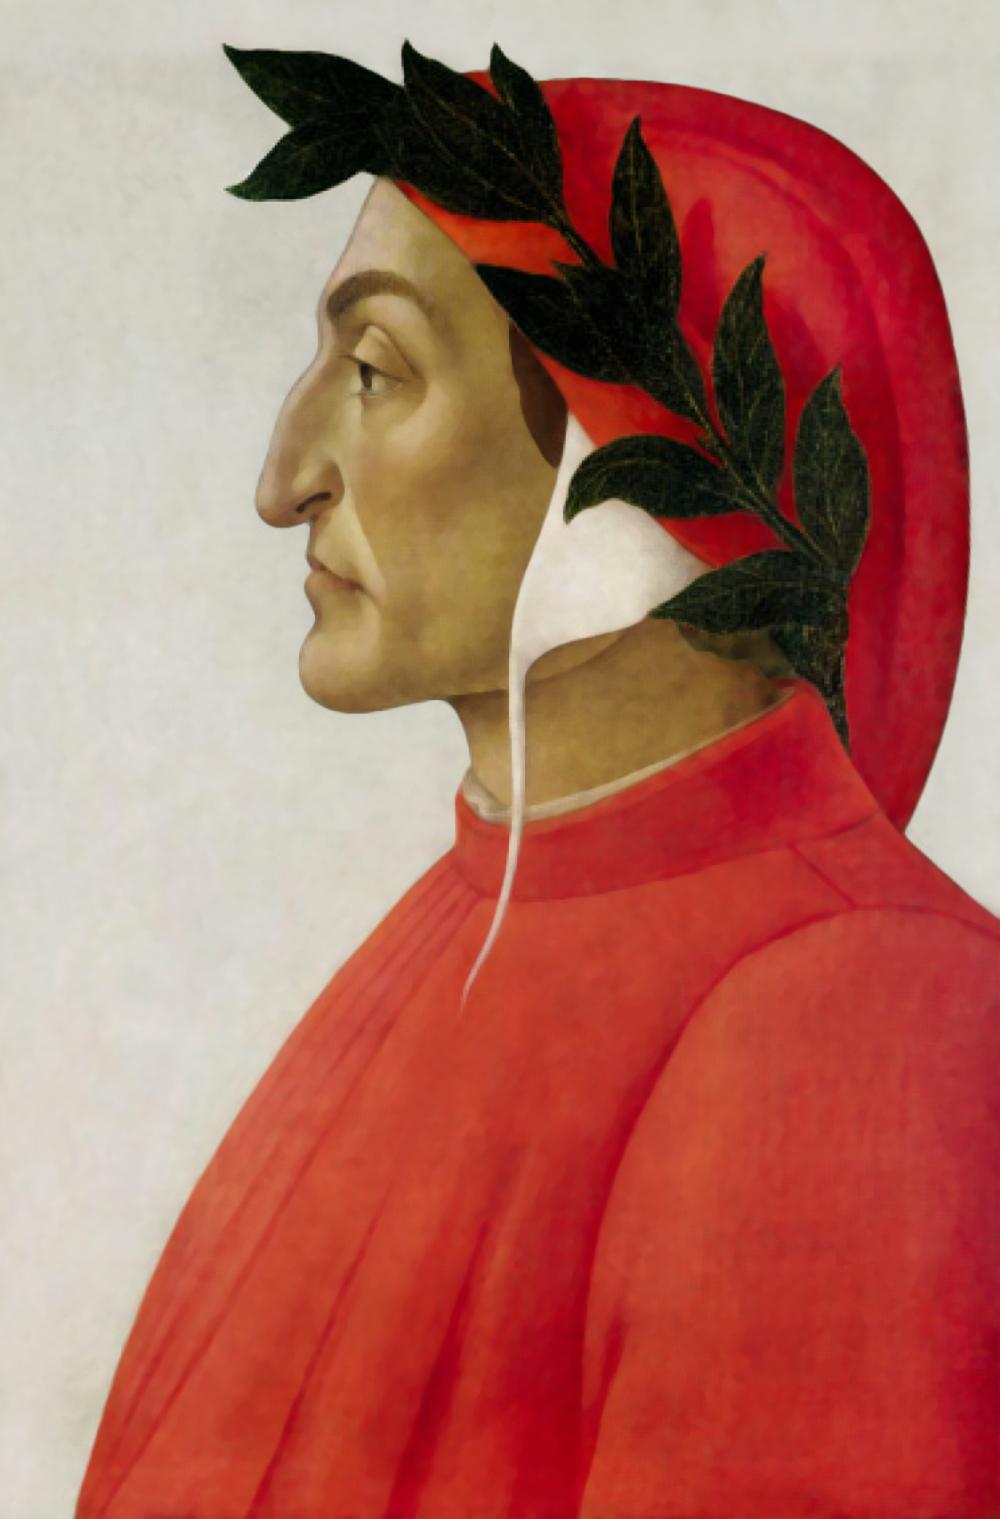 Portrait of Dante, Botticelli, 1495